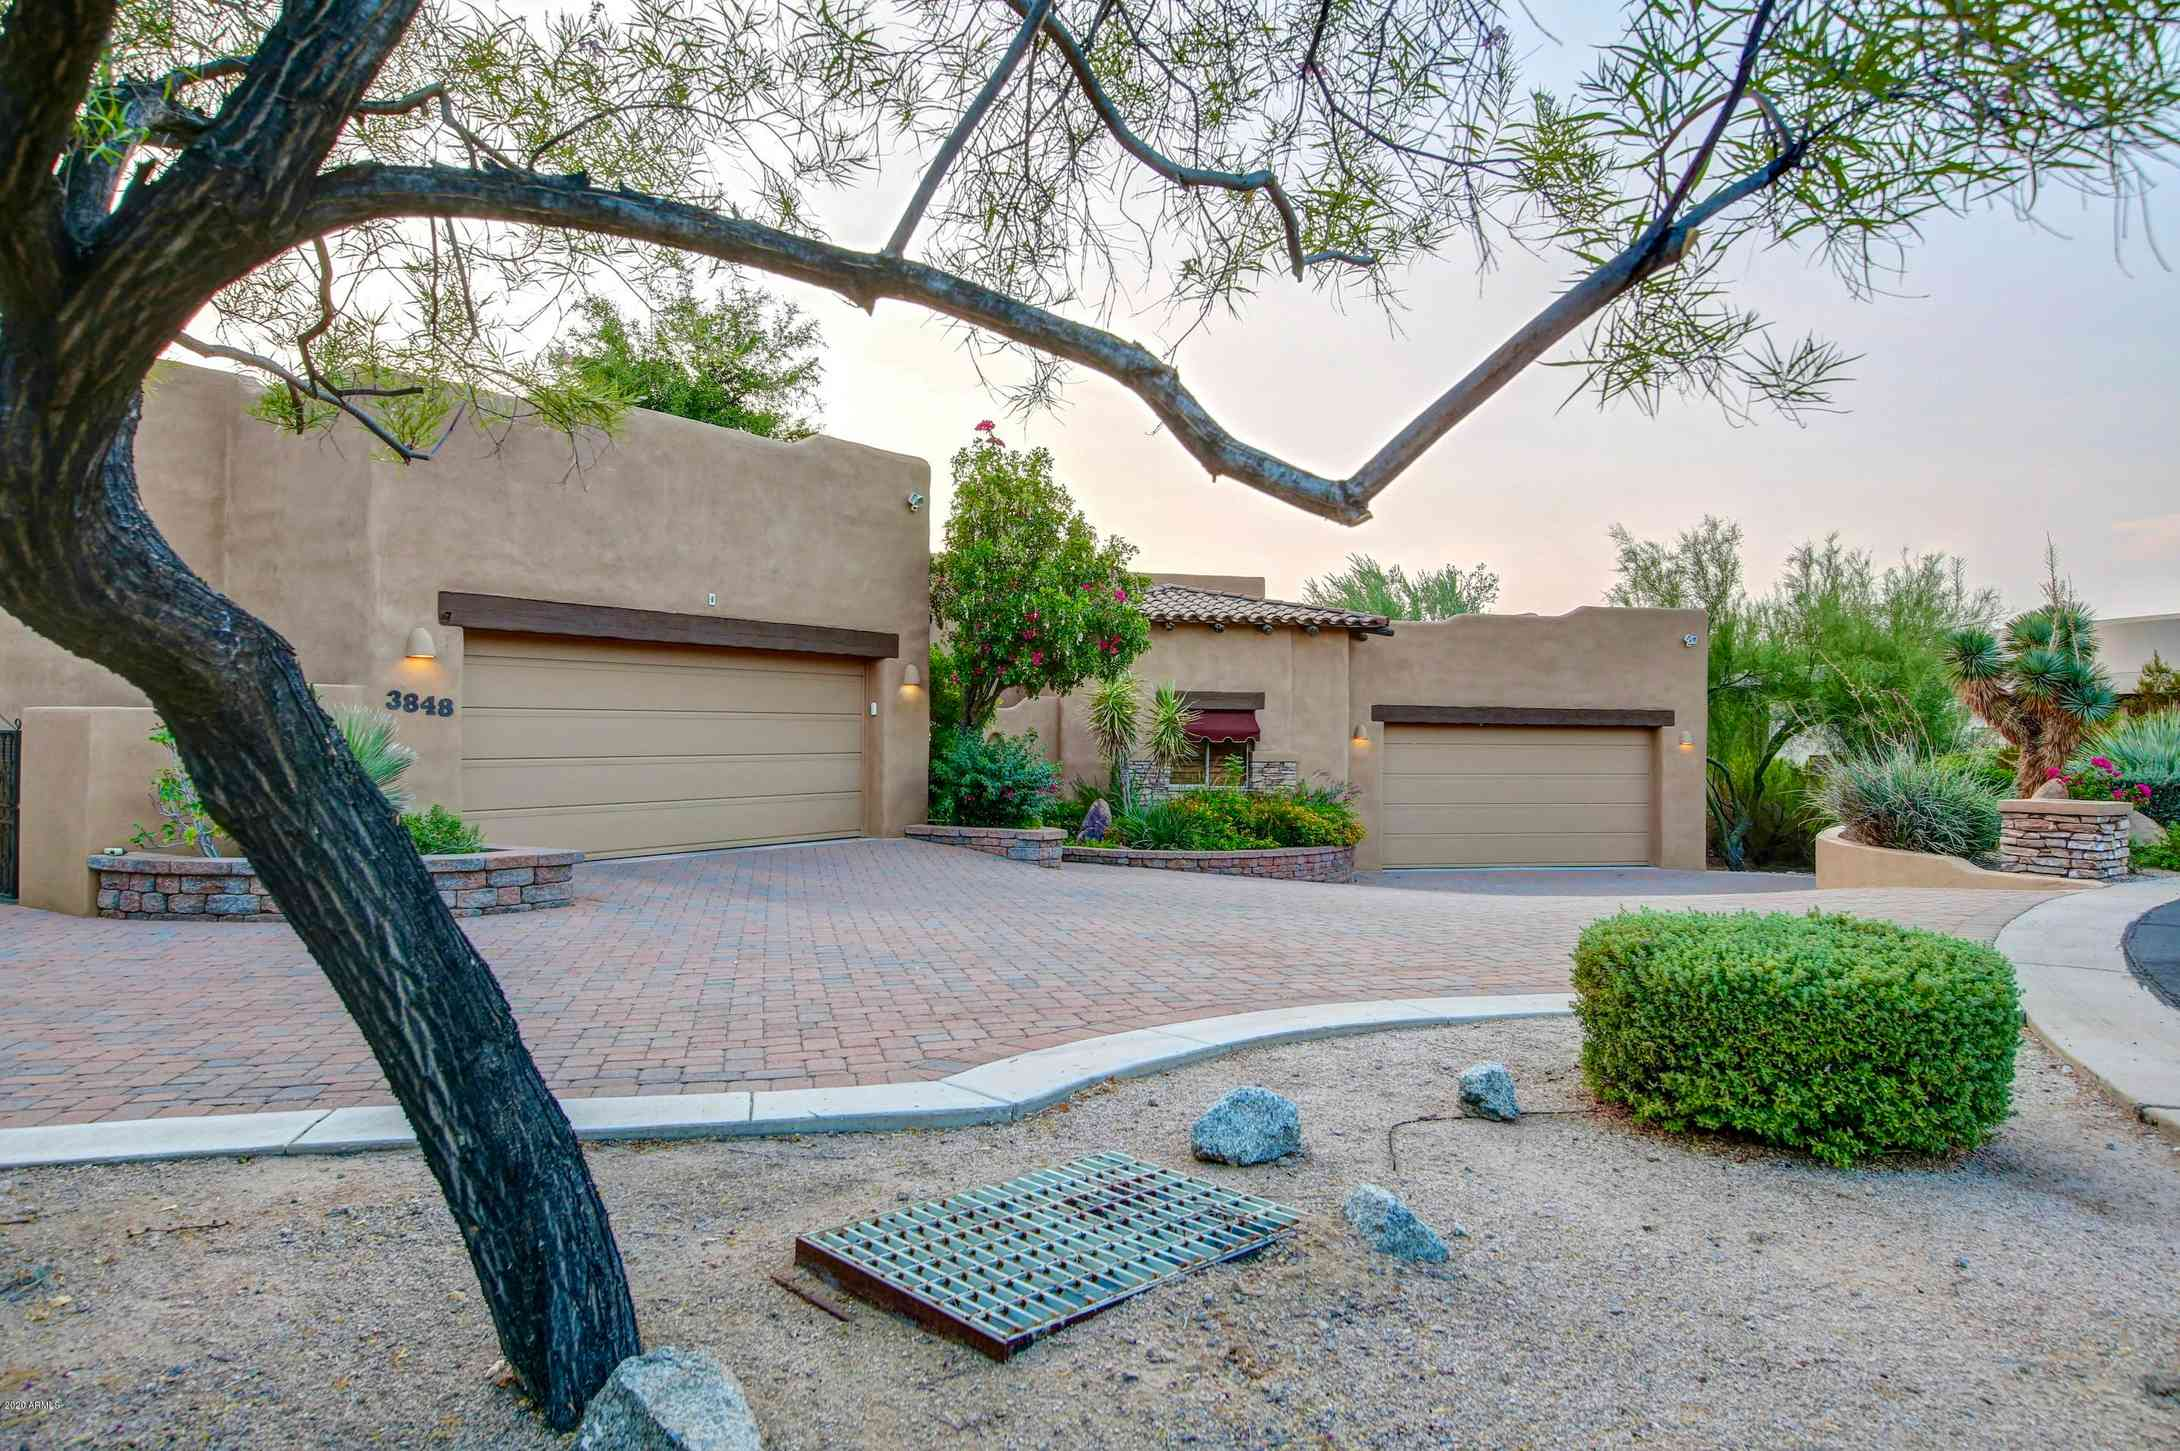 3848 N PINNACLE HILLS Circle, Mesa, AZ, 85207,